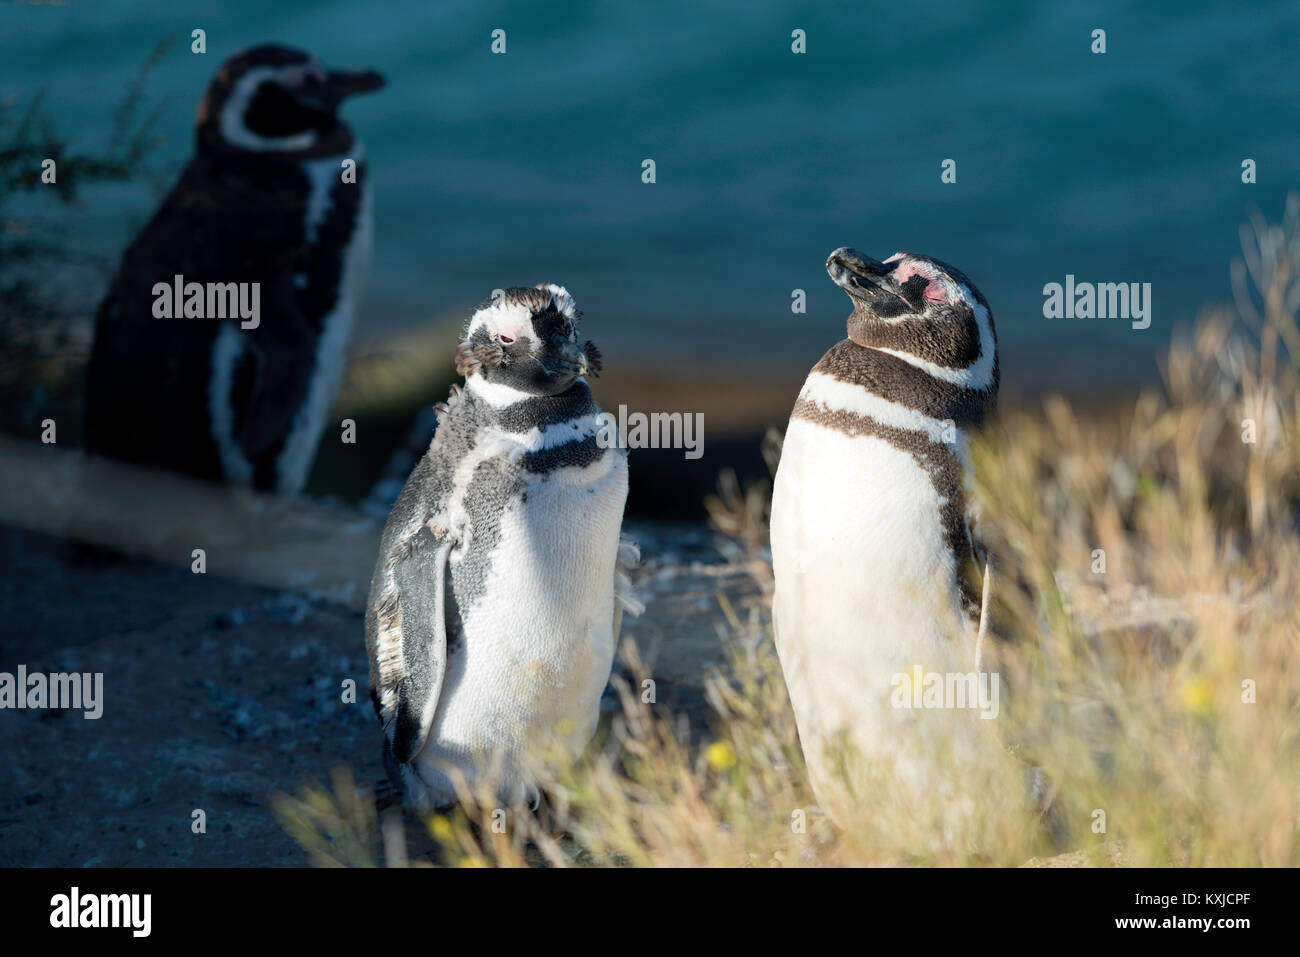 Magellanic penguin in natural environment, Peninsula Valdes, Patagonia, Argentina - Stock Image